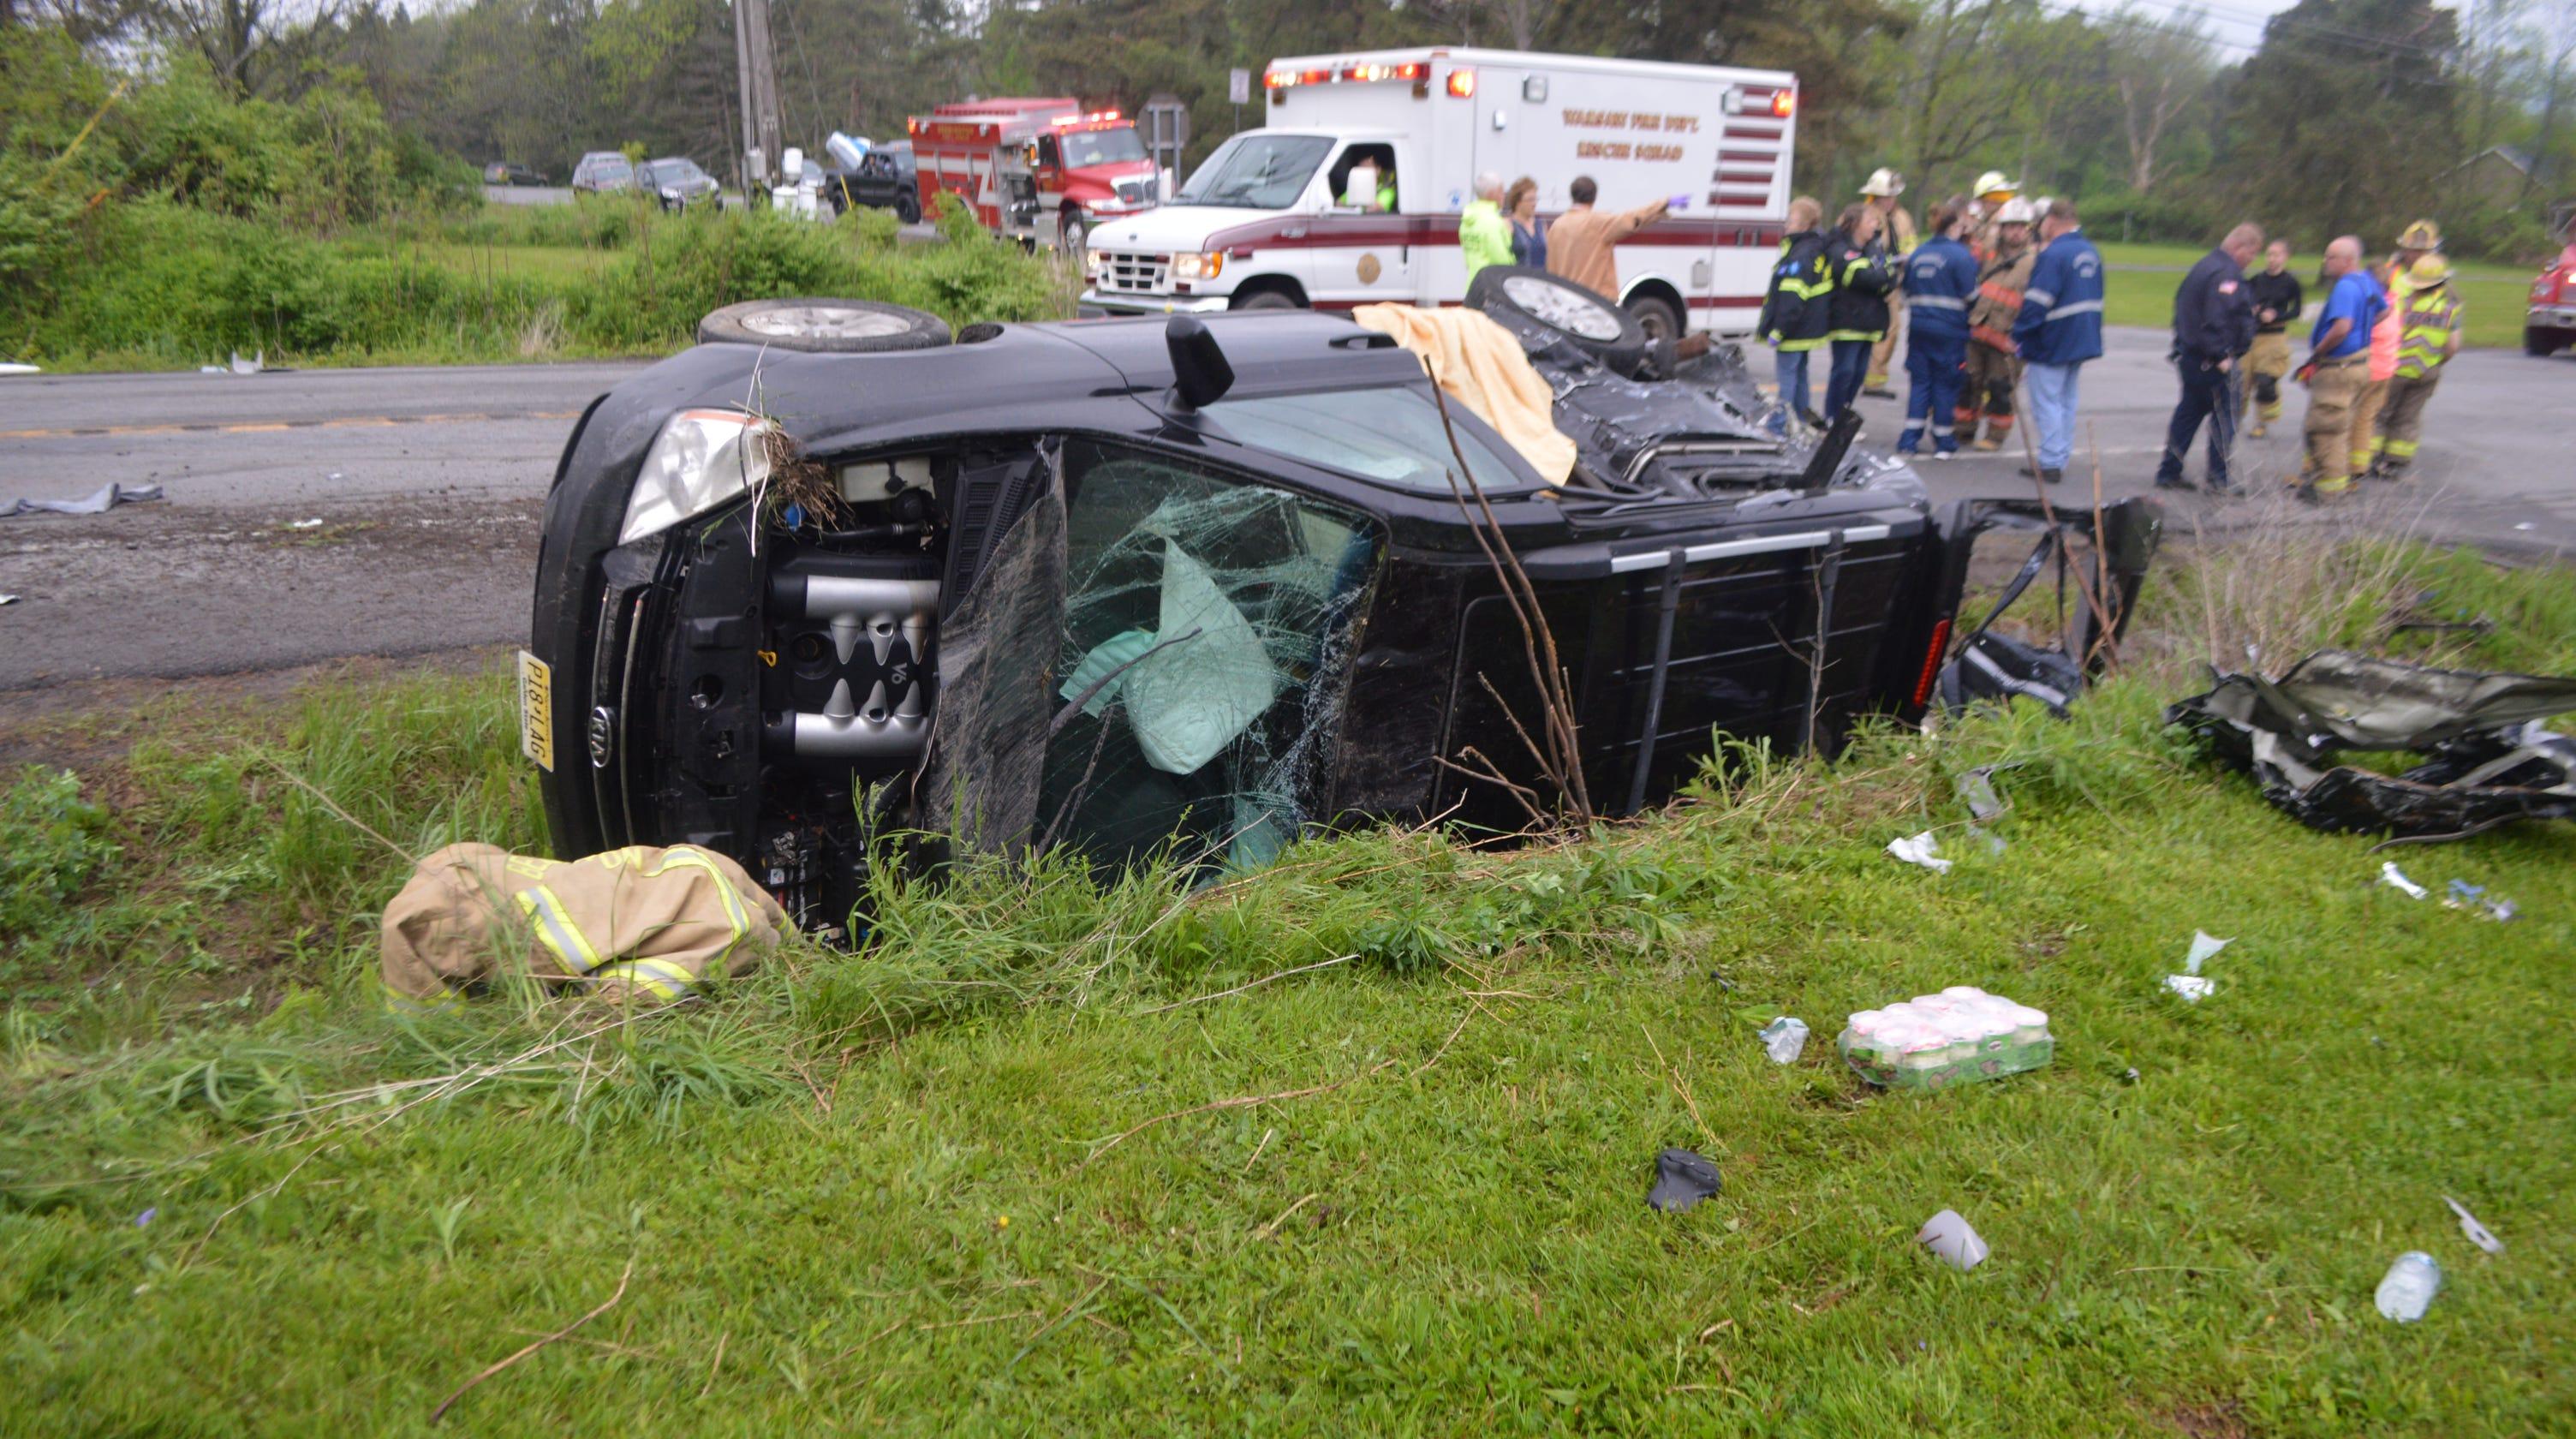 Perth Amboy girl remains critical following New York car crash